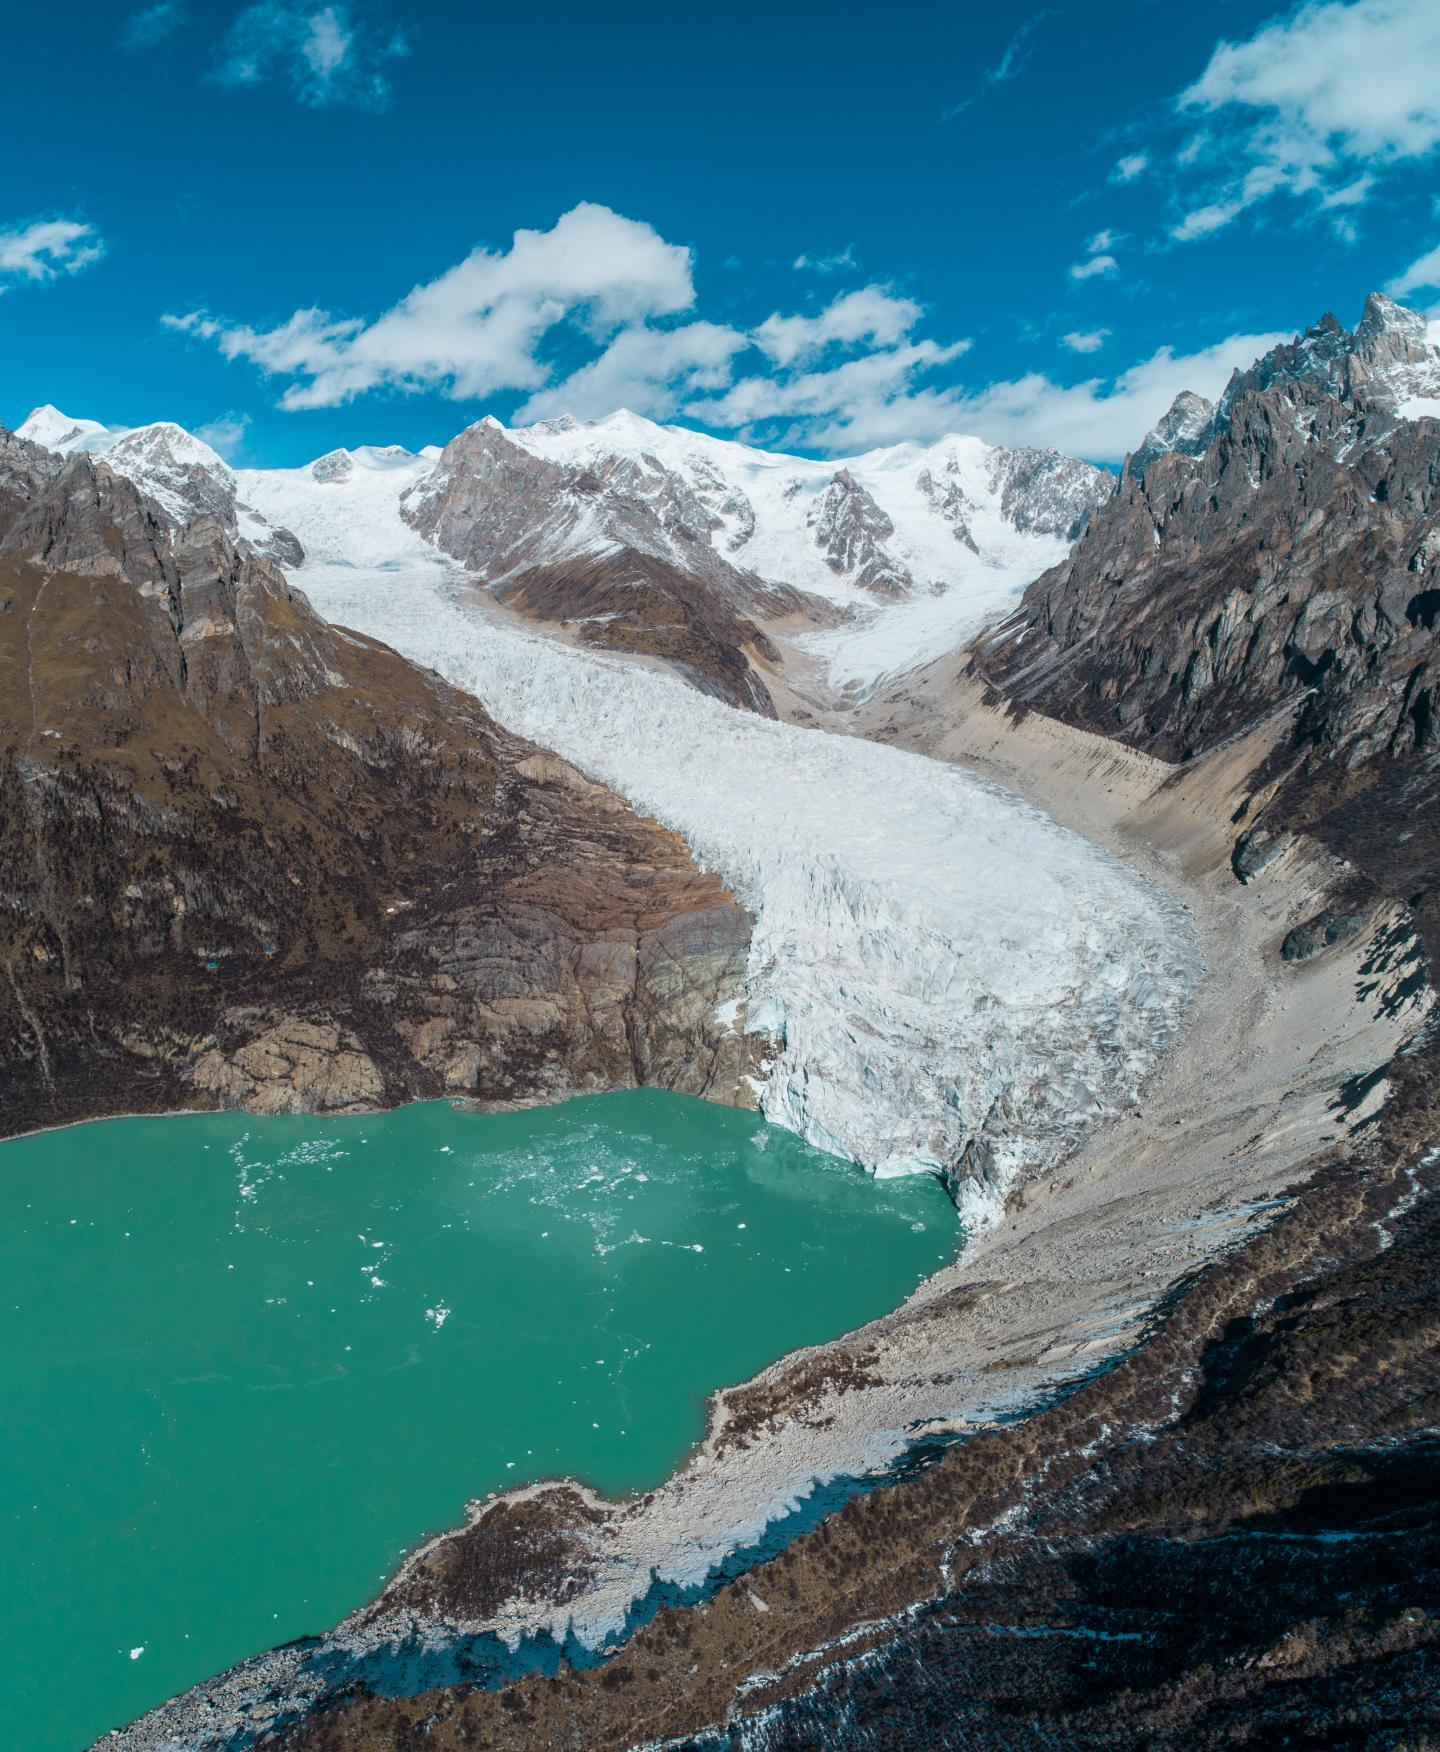 Glacial lake in the Himalayan region